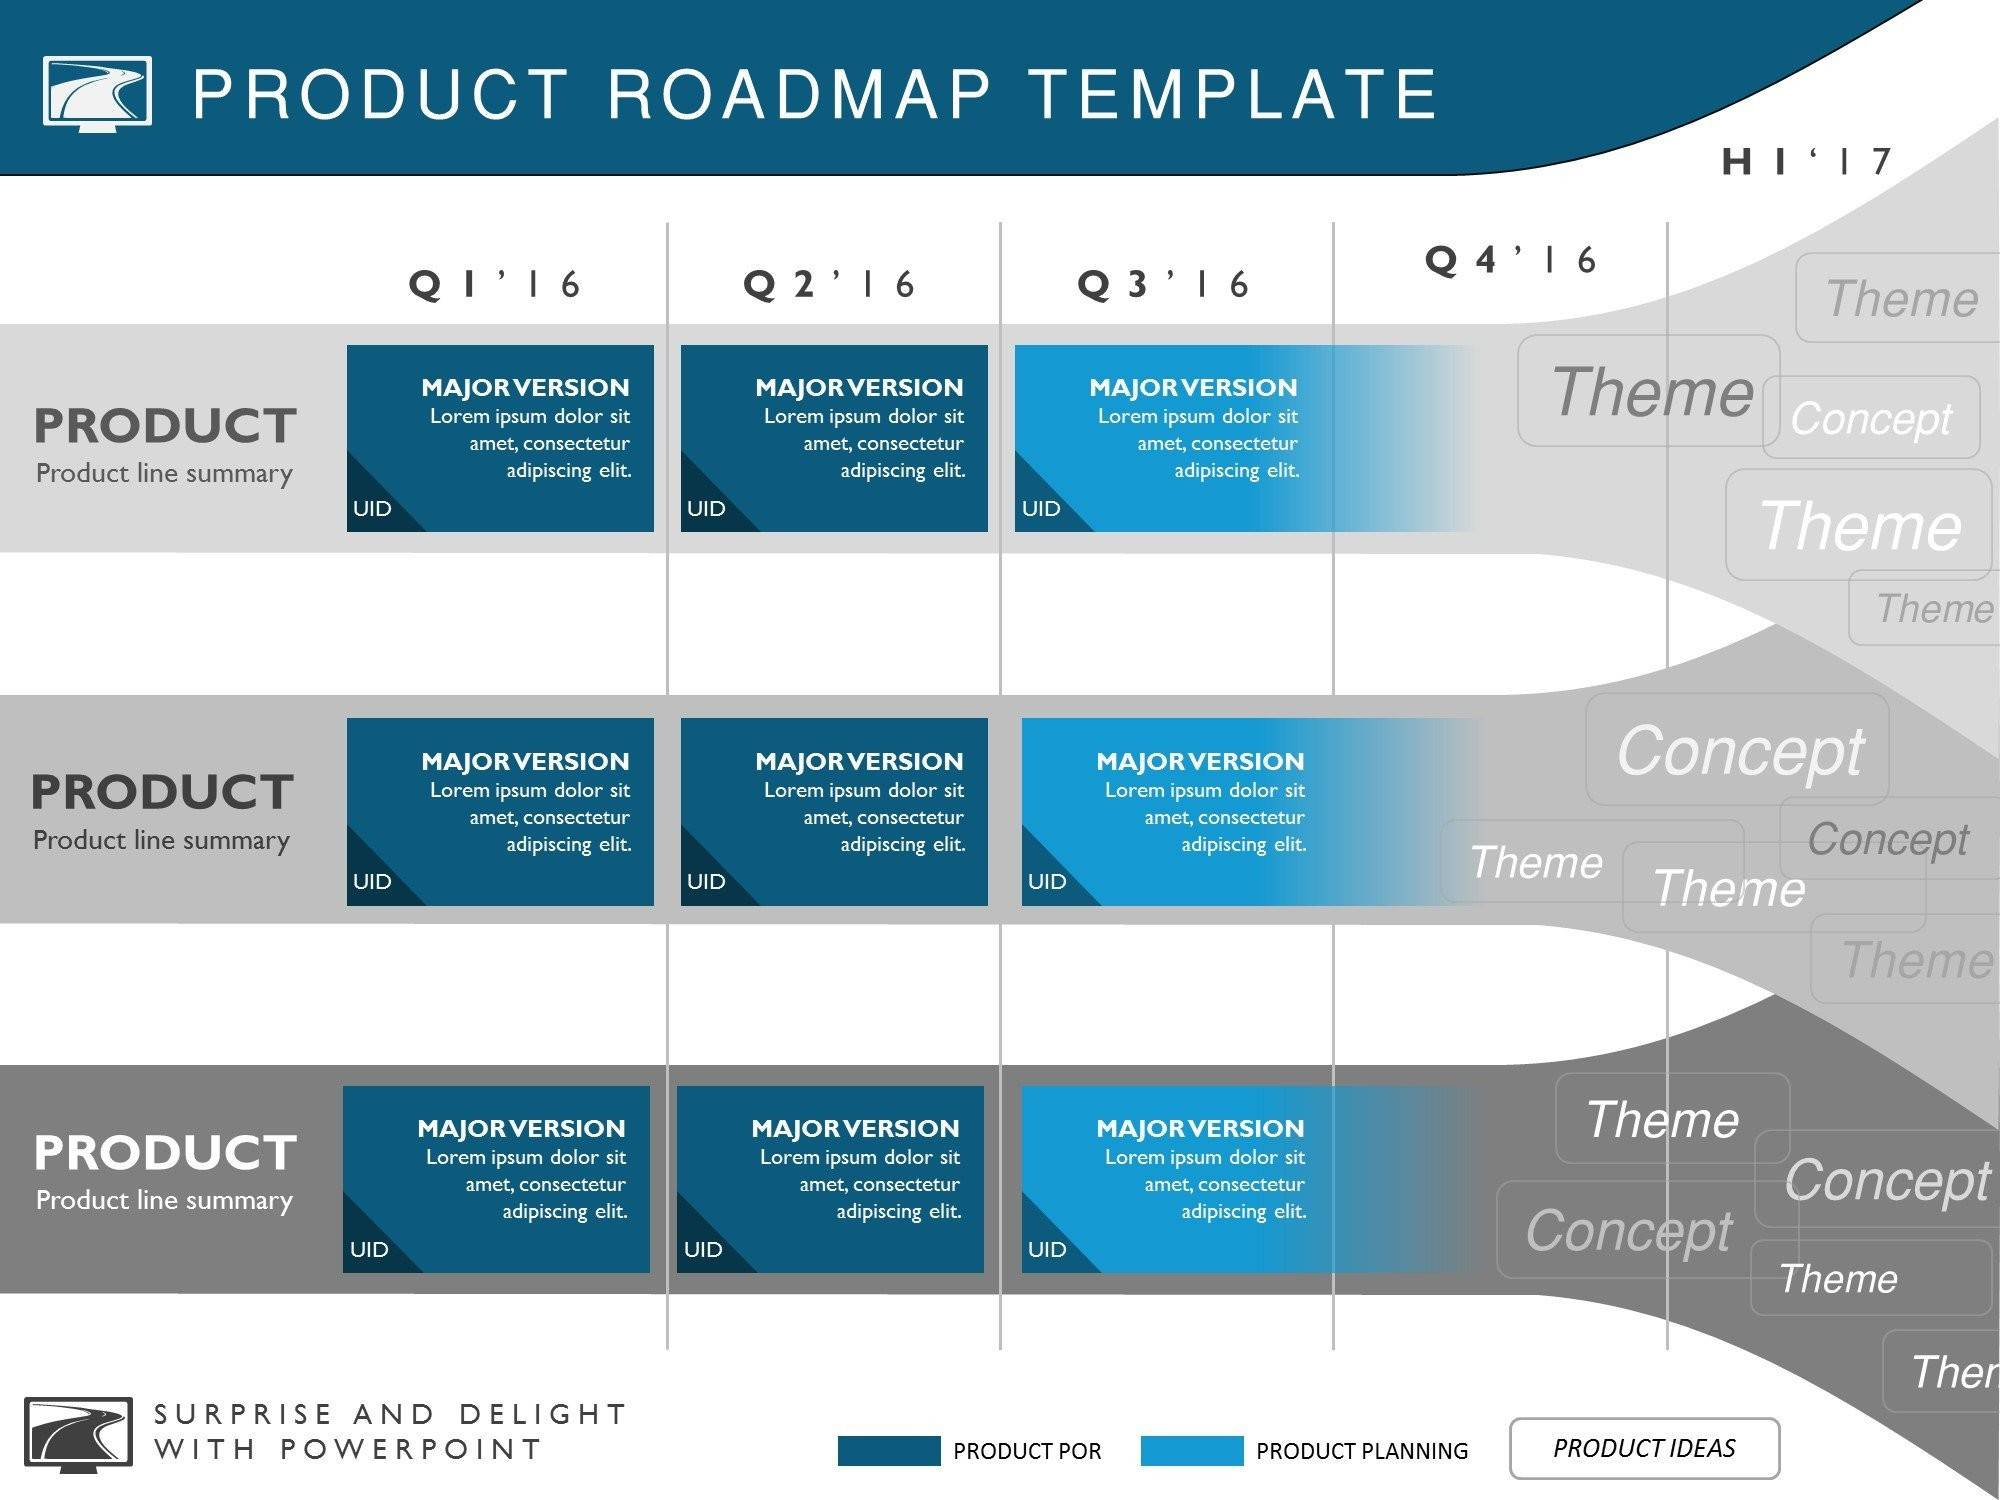 Powerpoint Templates Roadmap Sample